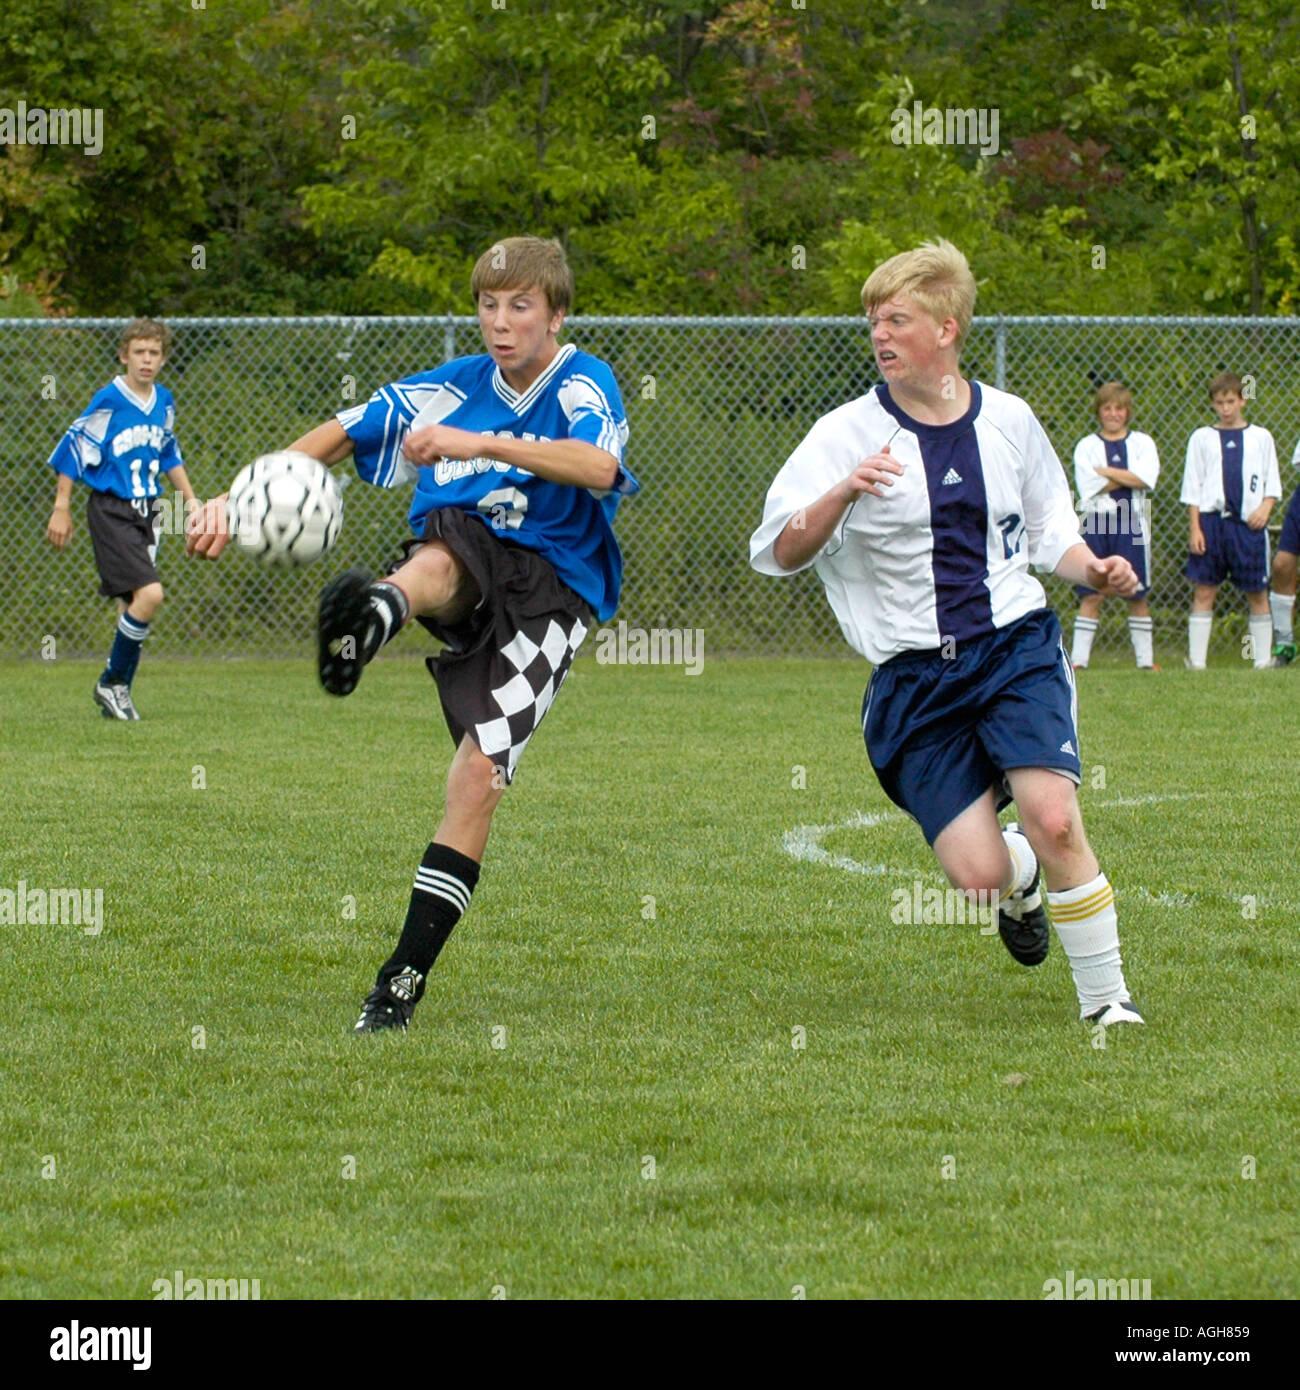 High School soccer futbol football action Port Huron Michigan - Stock Image